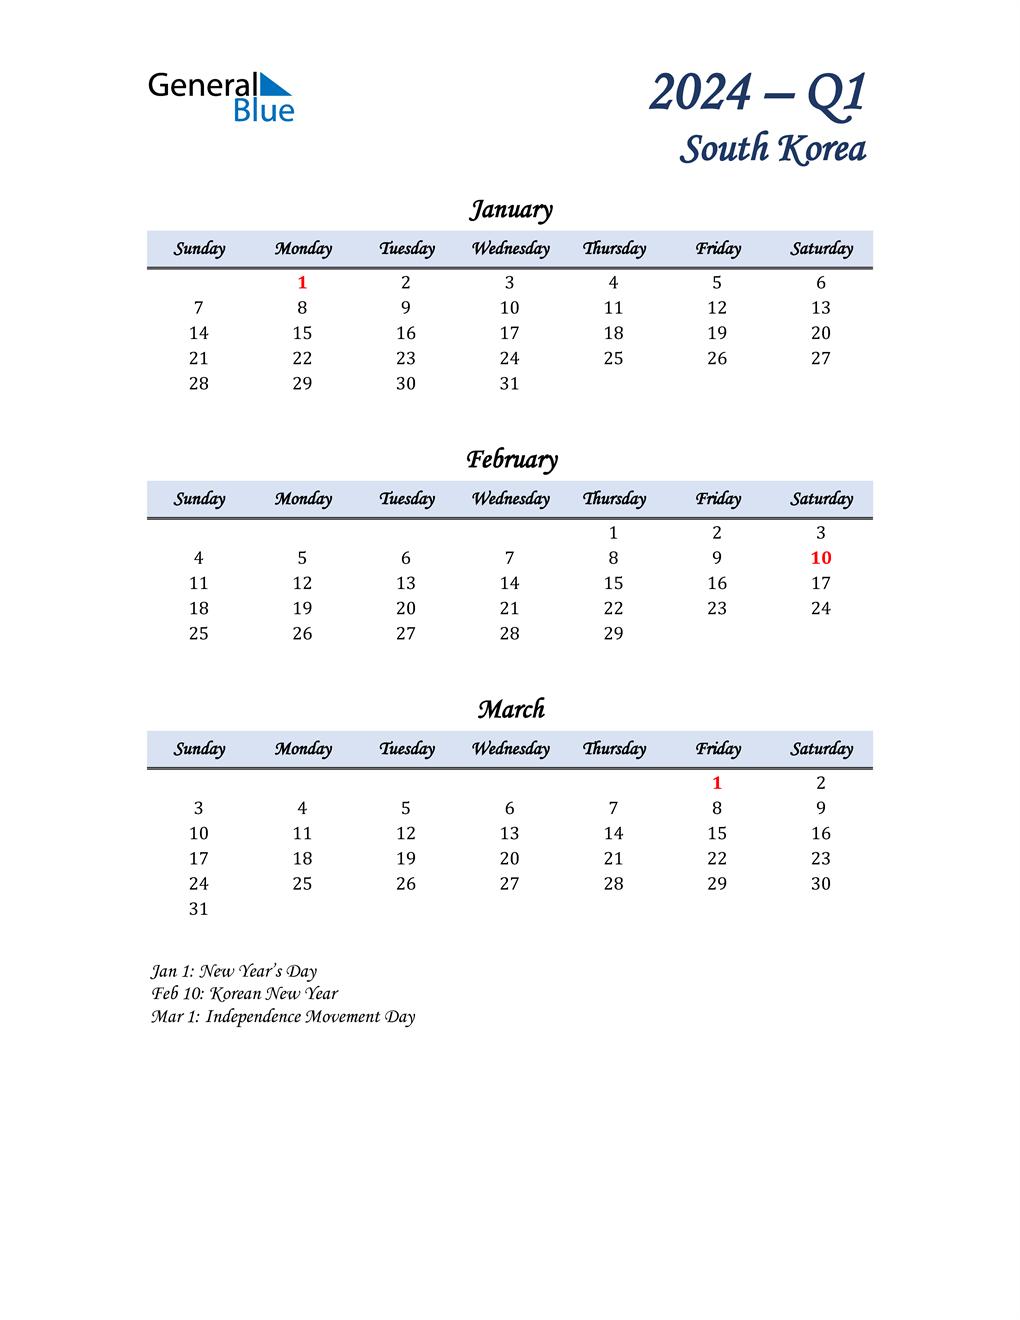 January, February, and March Calendar for South Korea